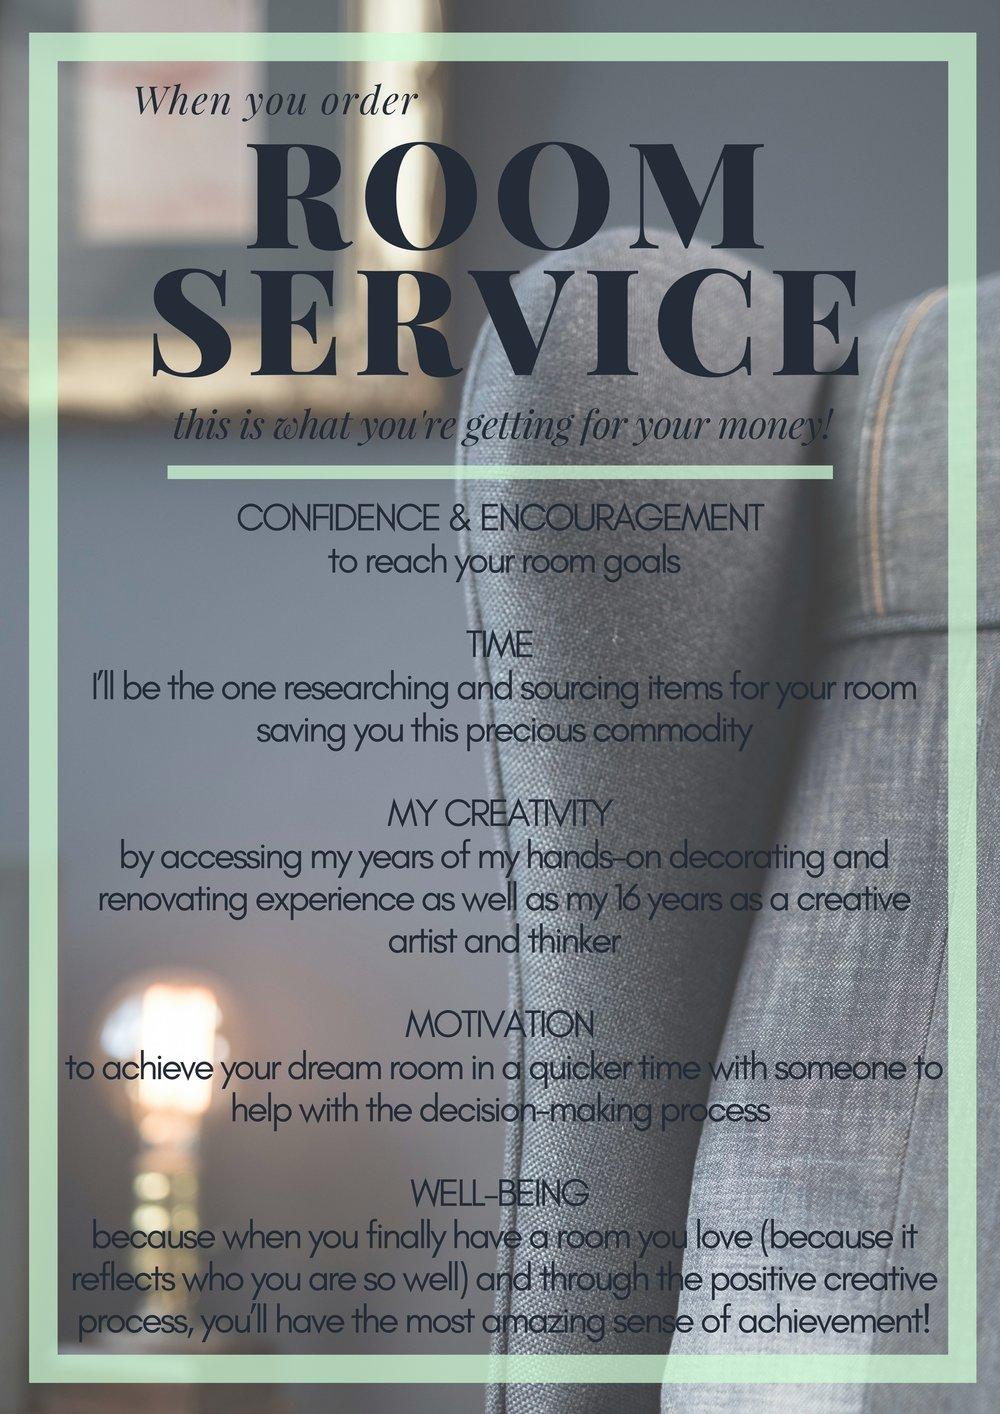 Benefits of Room Service